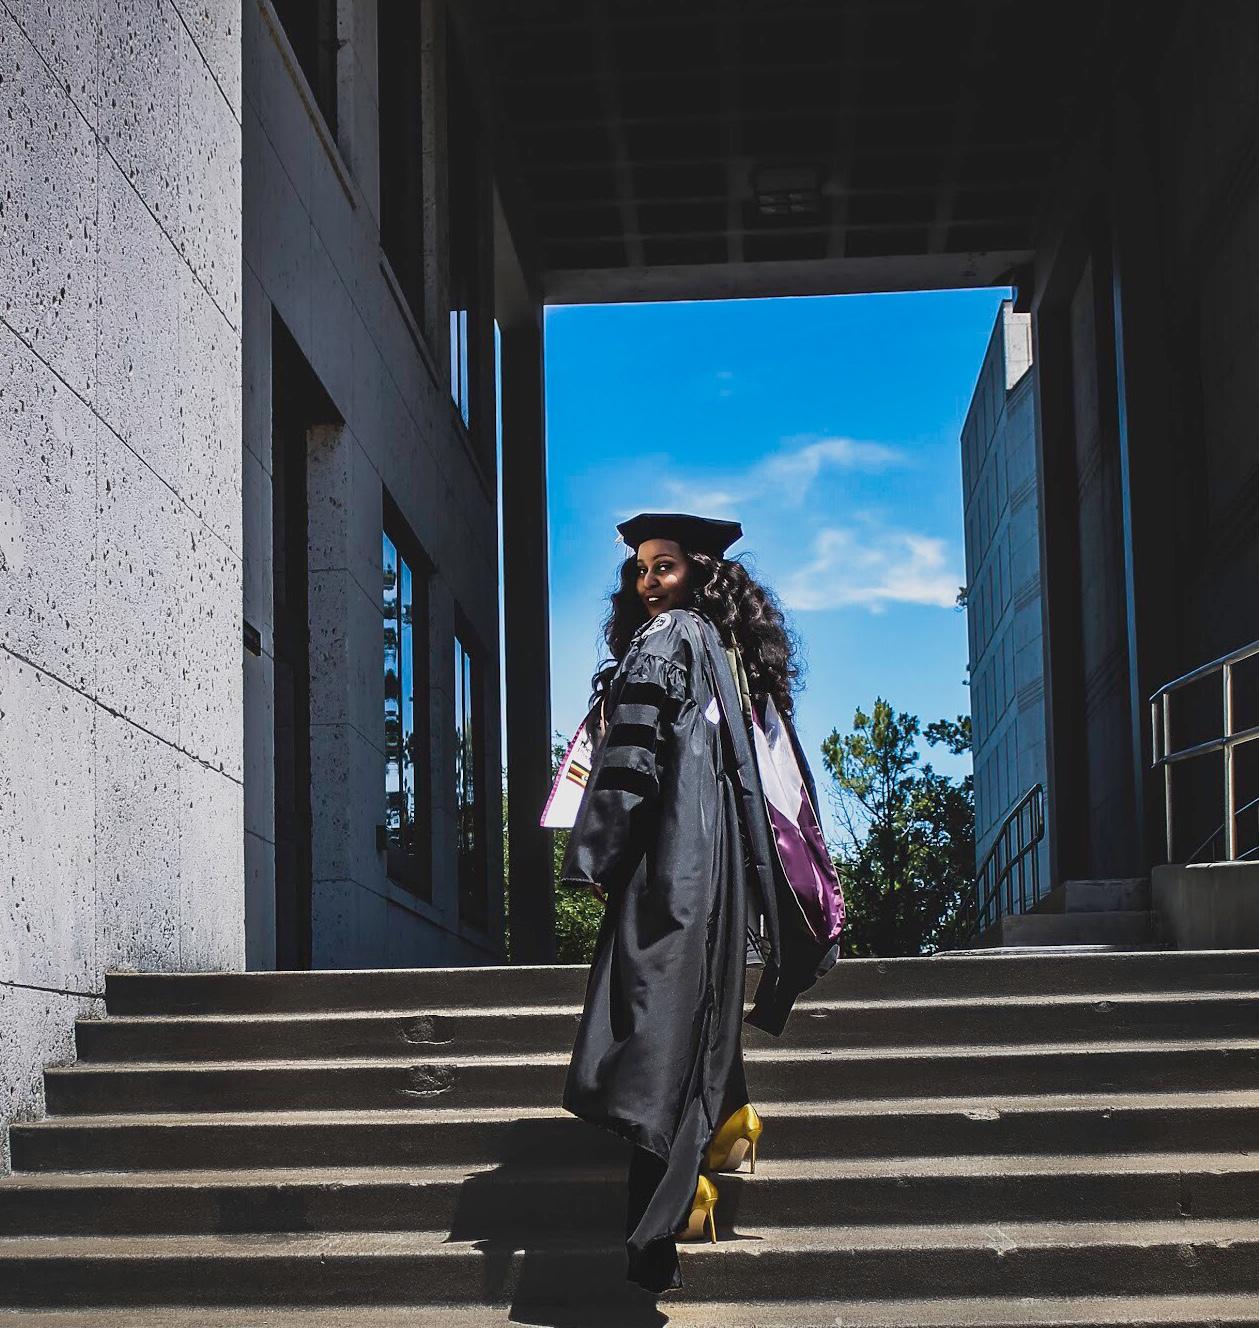 Tycoon Yusuf Matovu Youma Mahbuba Matovu Buba fabulous graduates PhD Pharmacy